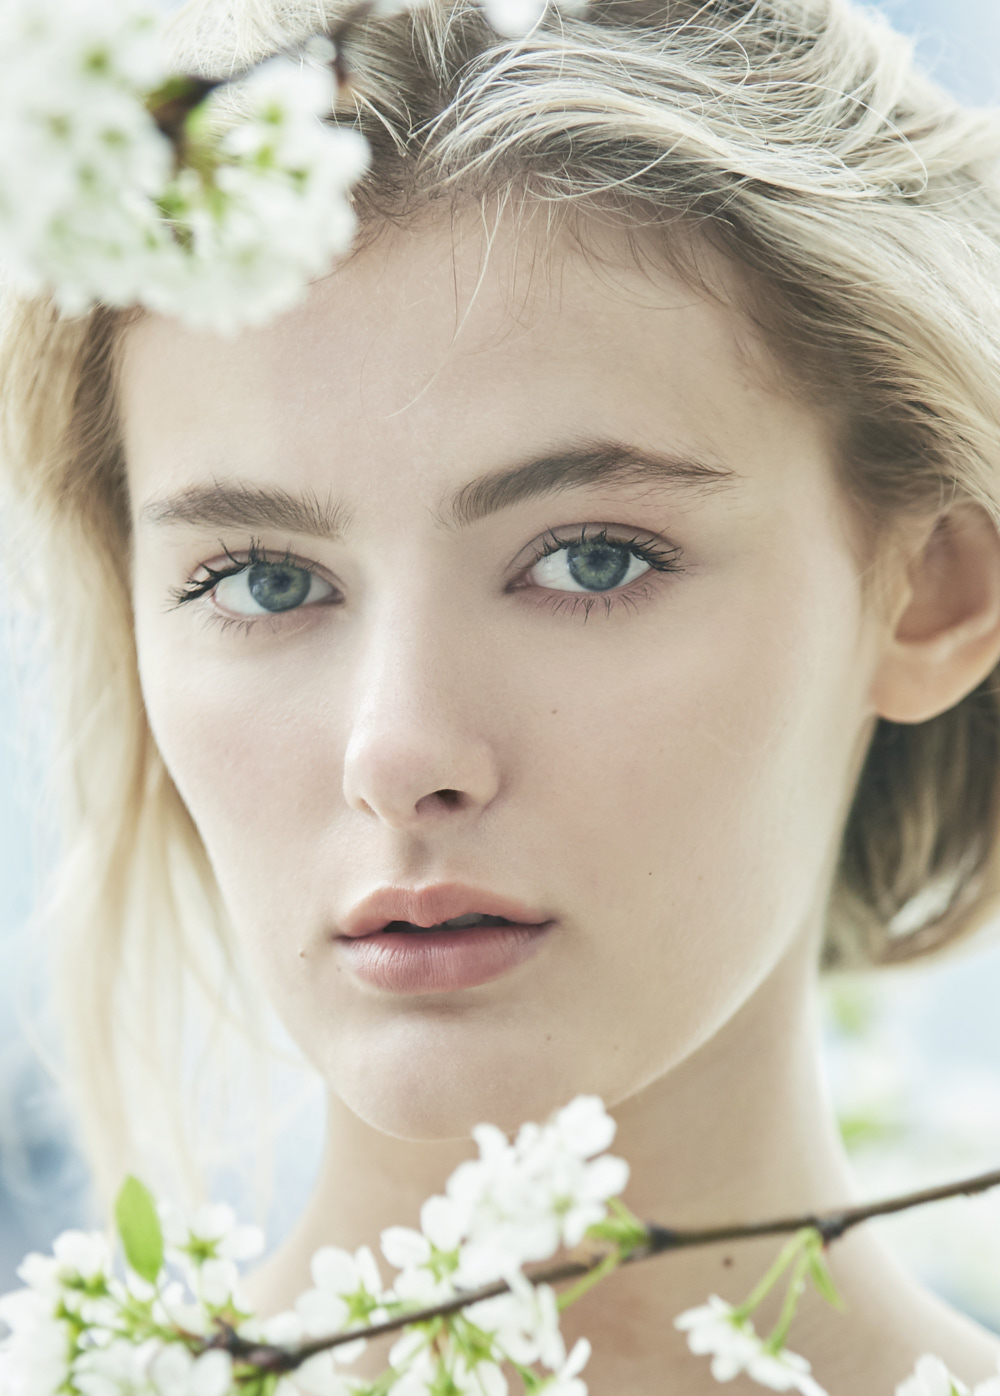 data | New York Beauty Skincare Cosmetics Photographer NY NYC | VIKRAM PATHAK